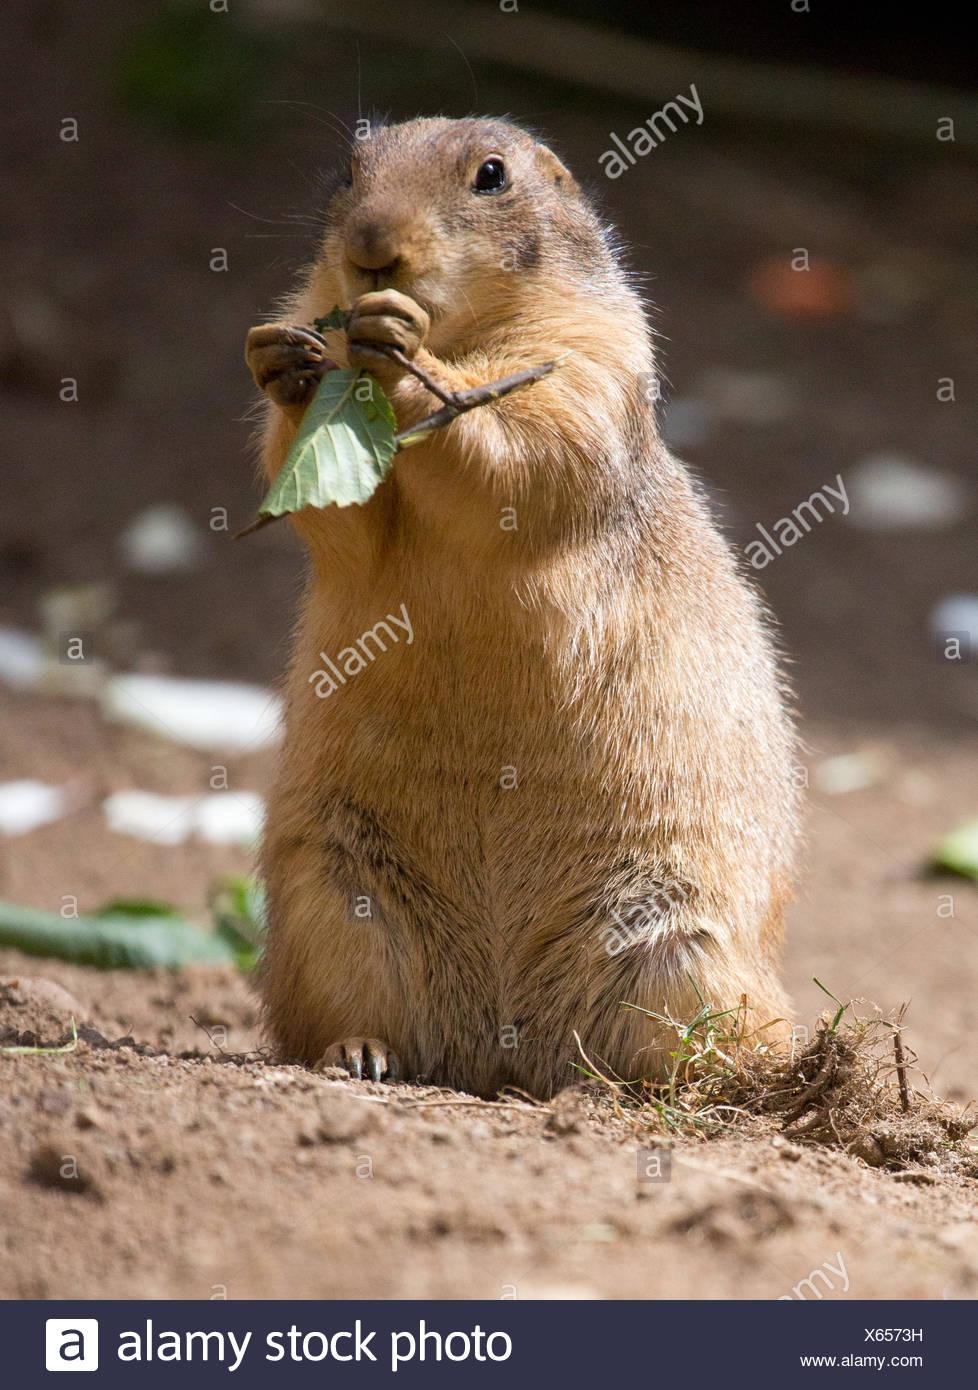 eating prairie dog X6573H